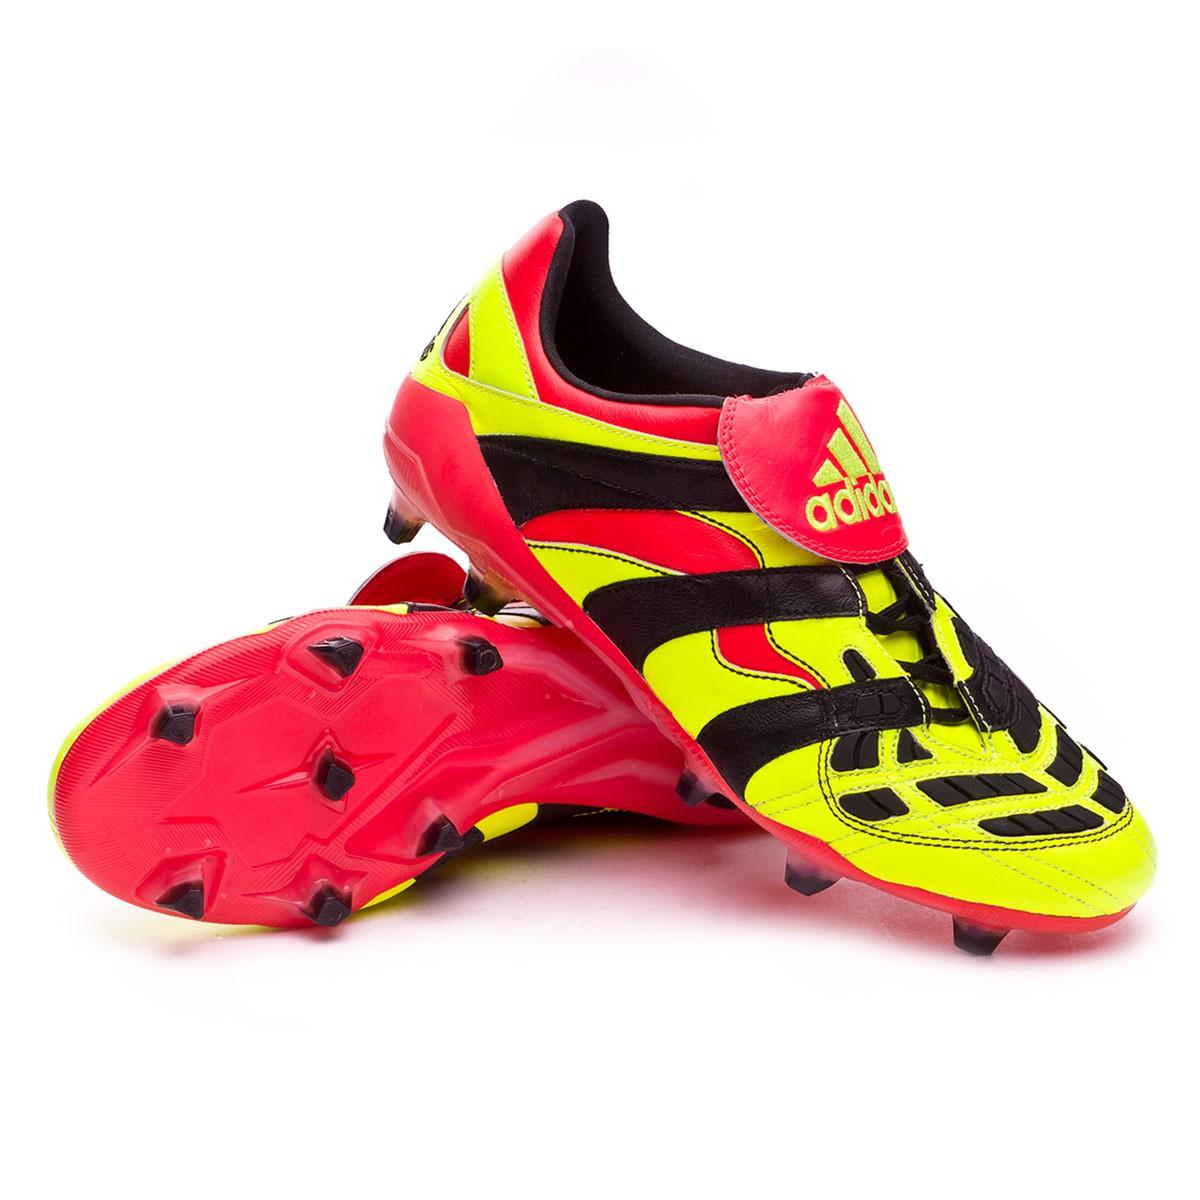 3306d610ce3 Football Boots adidas Predator Accelerator FG Solar yellow ...